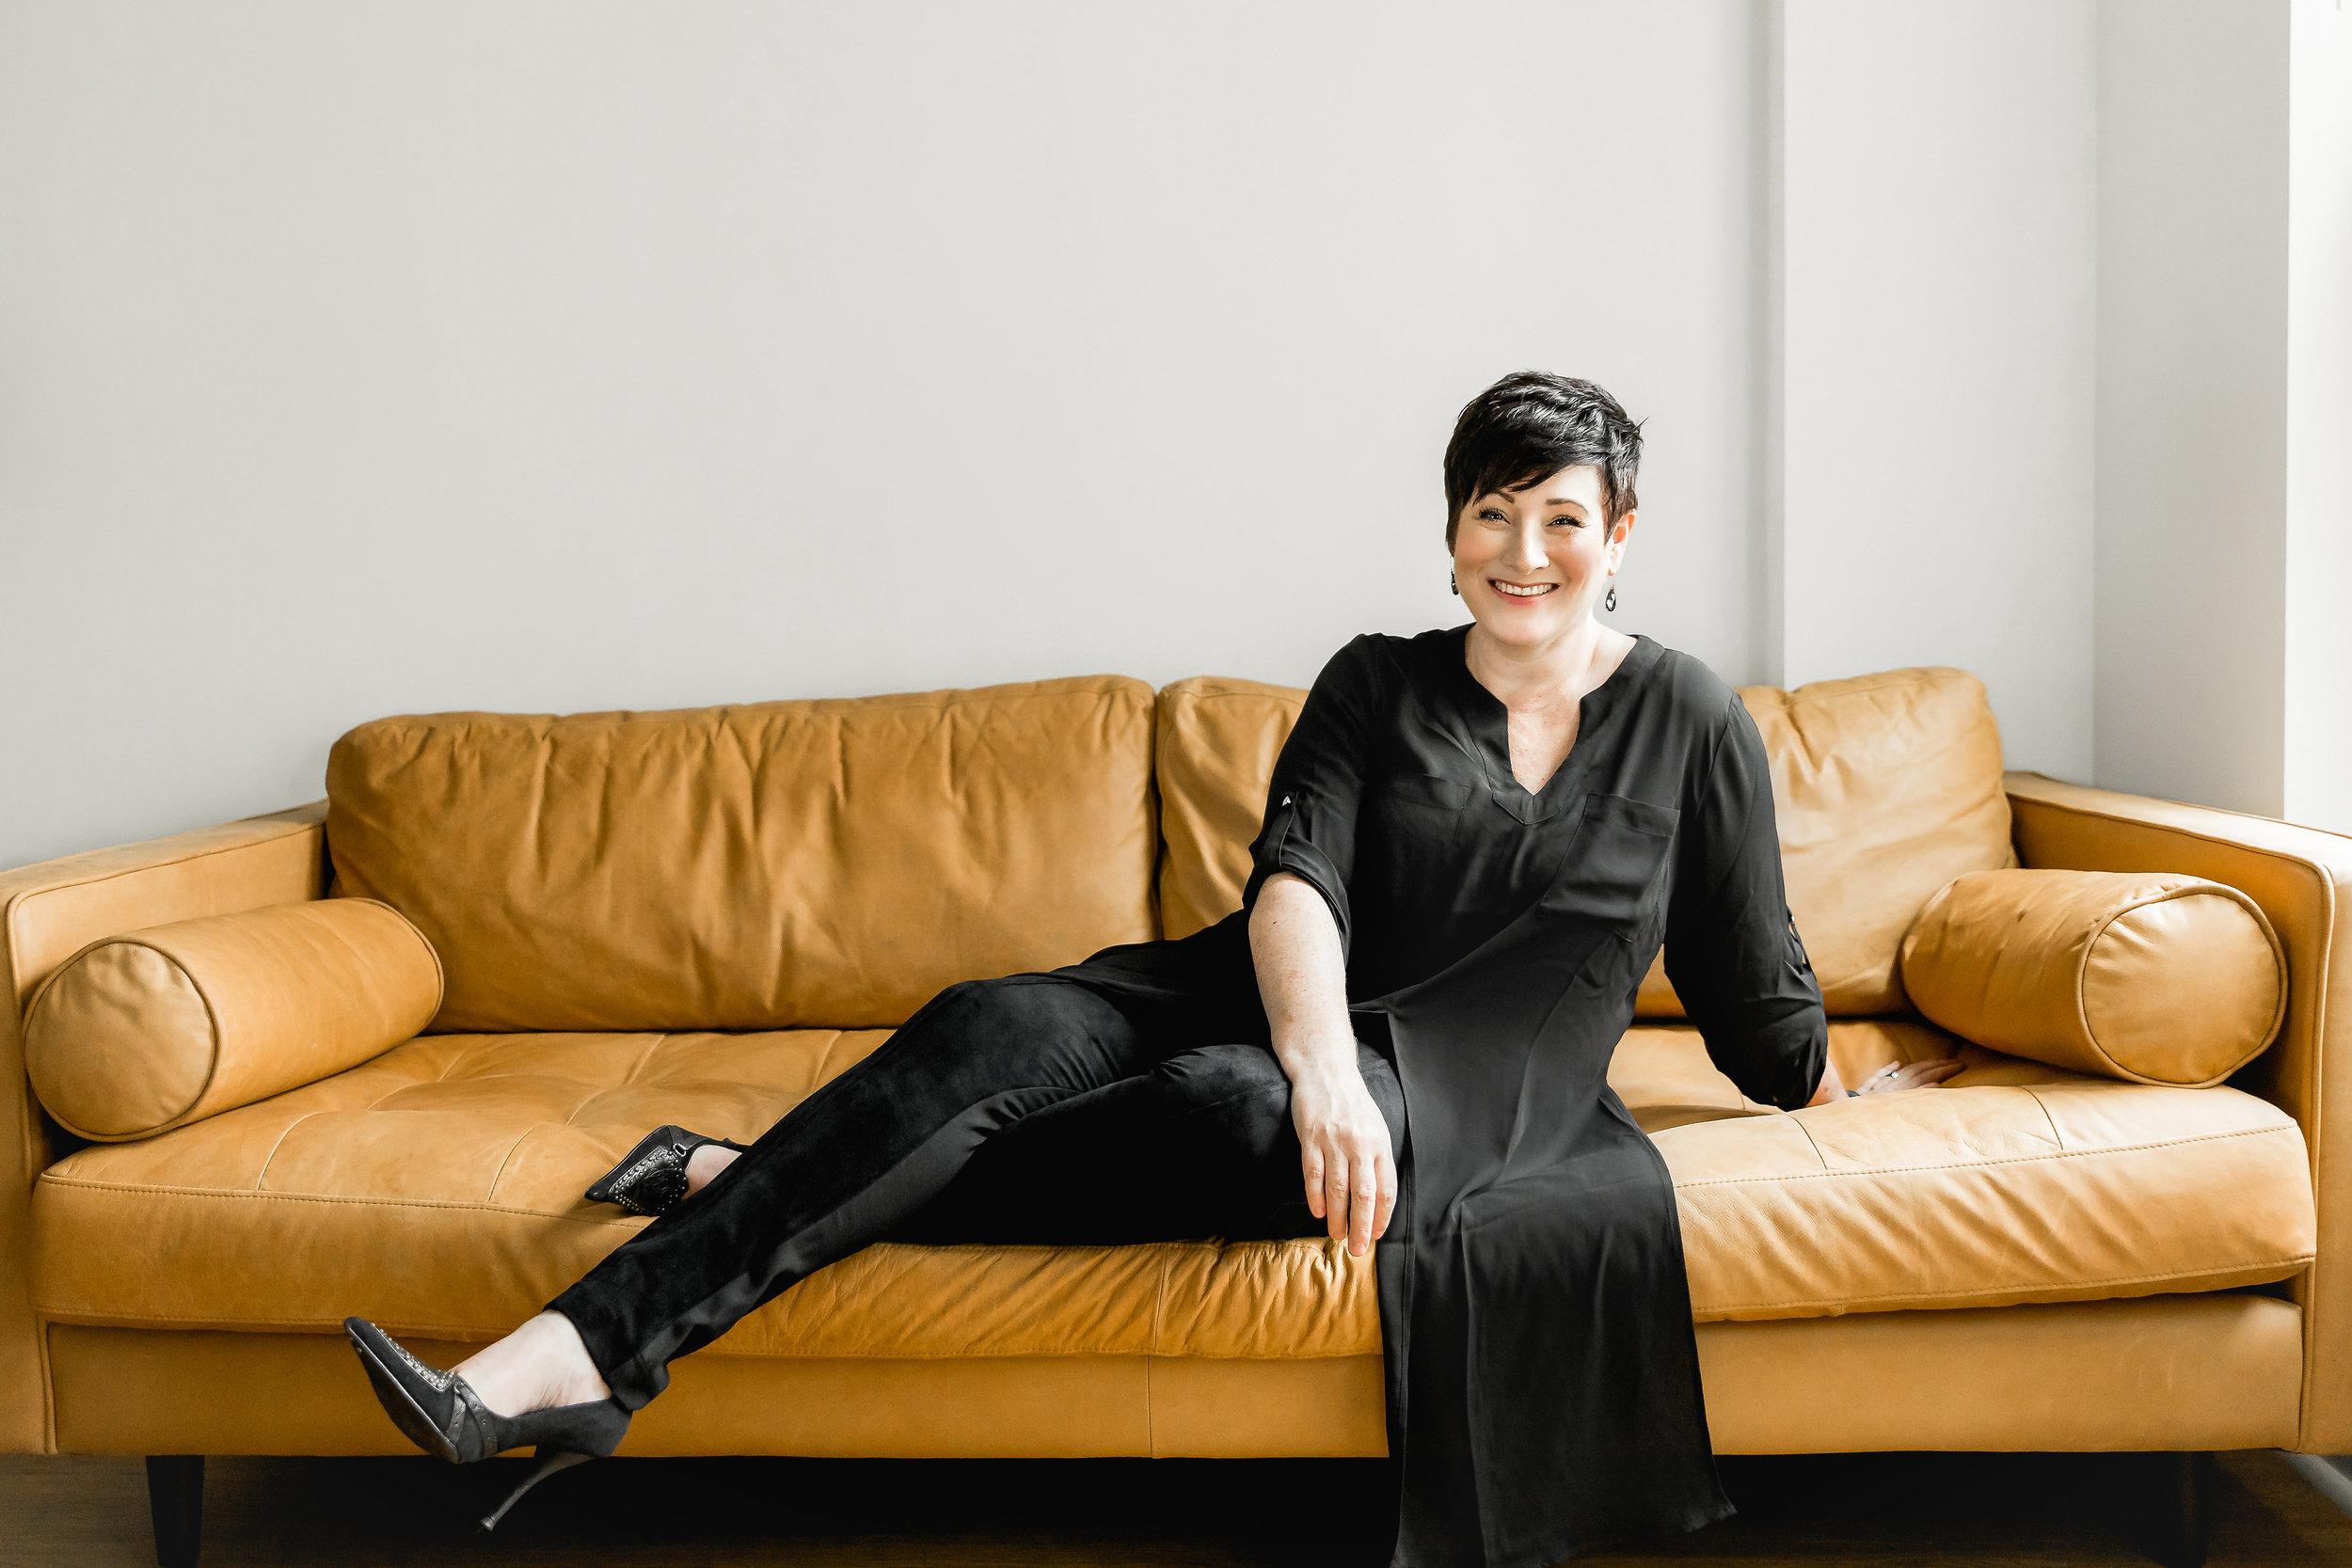 Susan-Eichhorn-Young_02_cckaleighraephotography.jpg